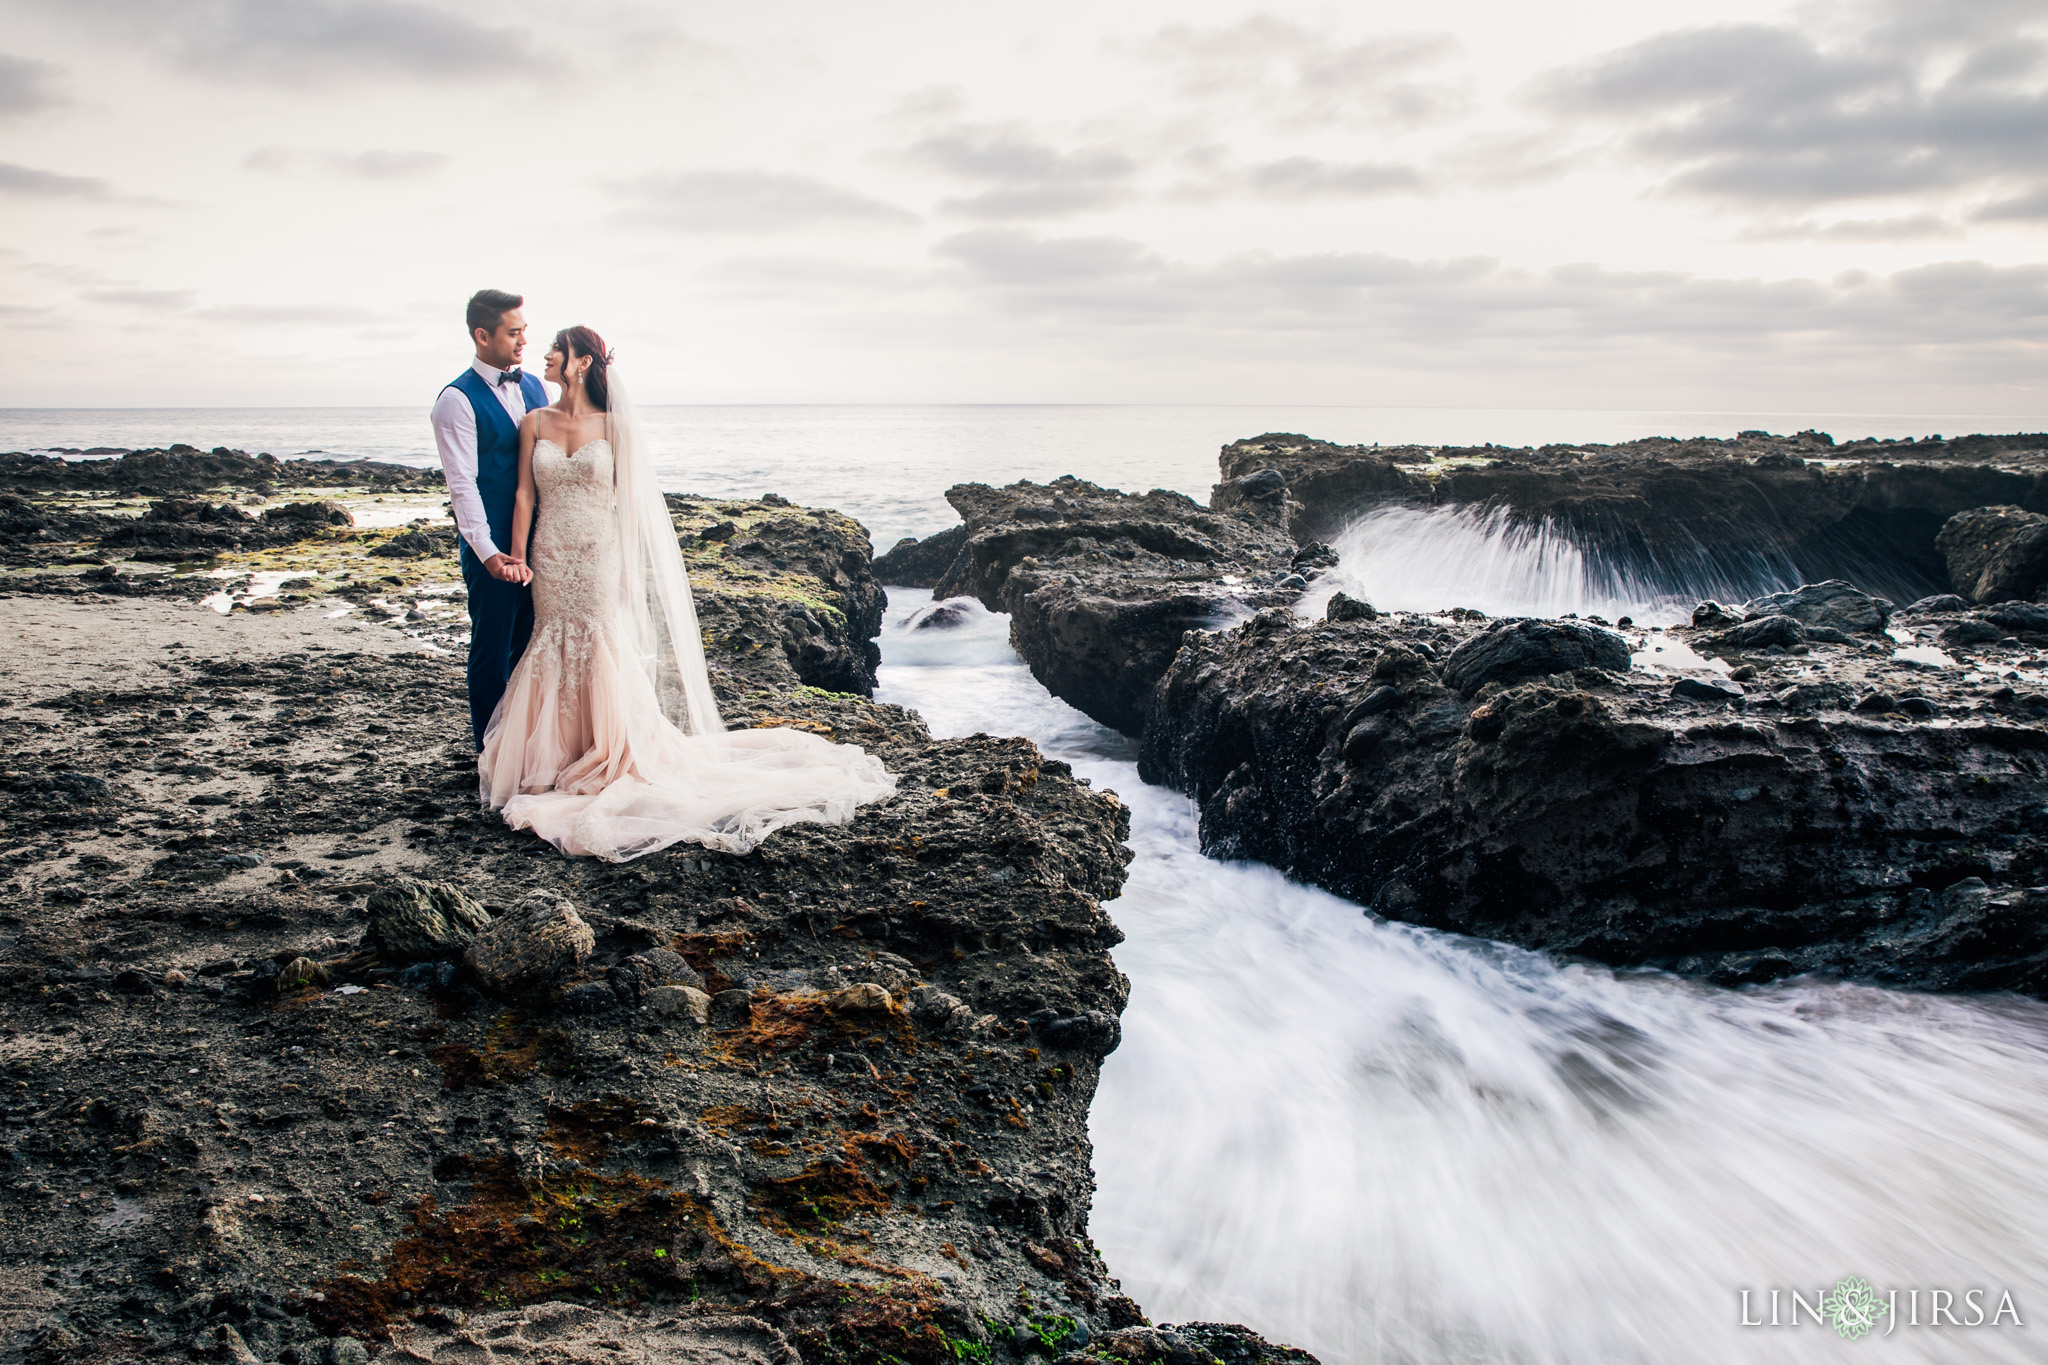 008 victoria beach orange county post wedding photography